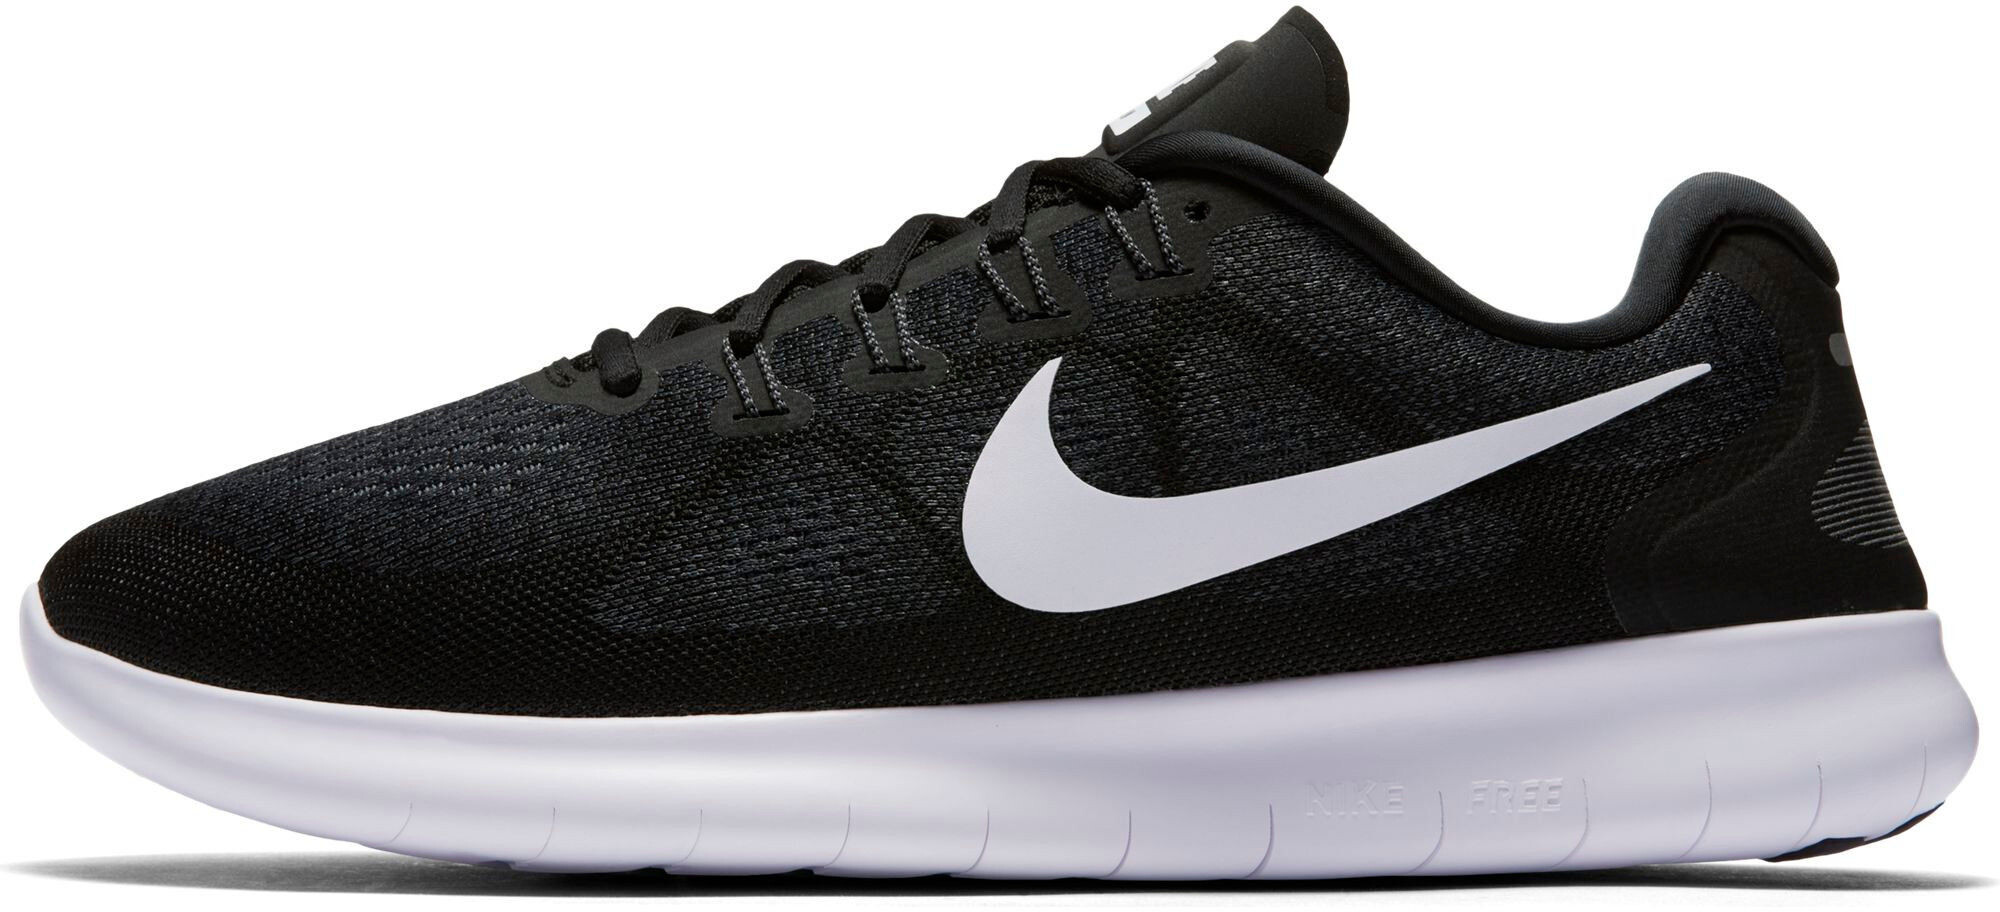 discount nike free 3.0 v3 mens black gray shoes Nike Air Pink ... 2fbf8f24a